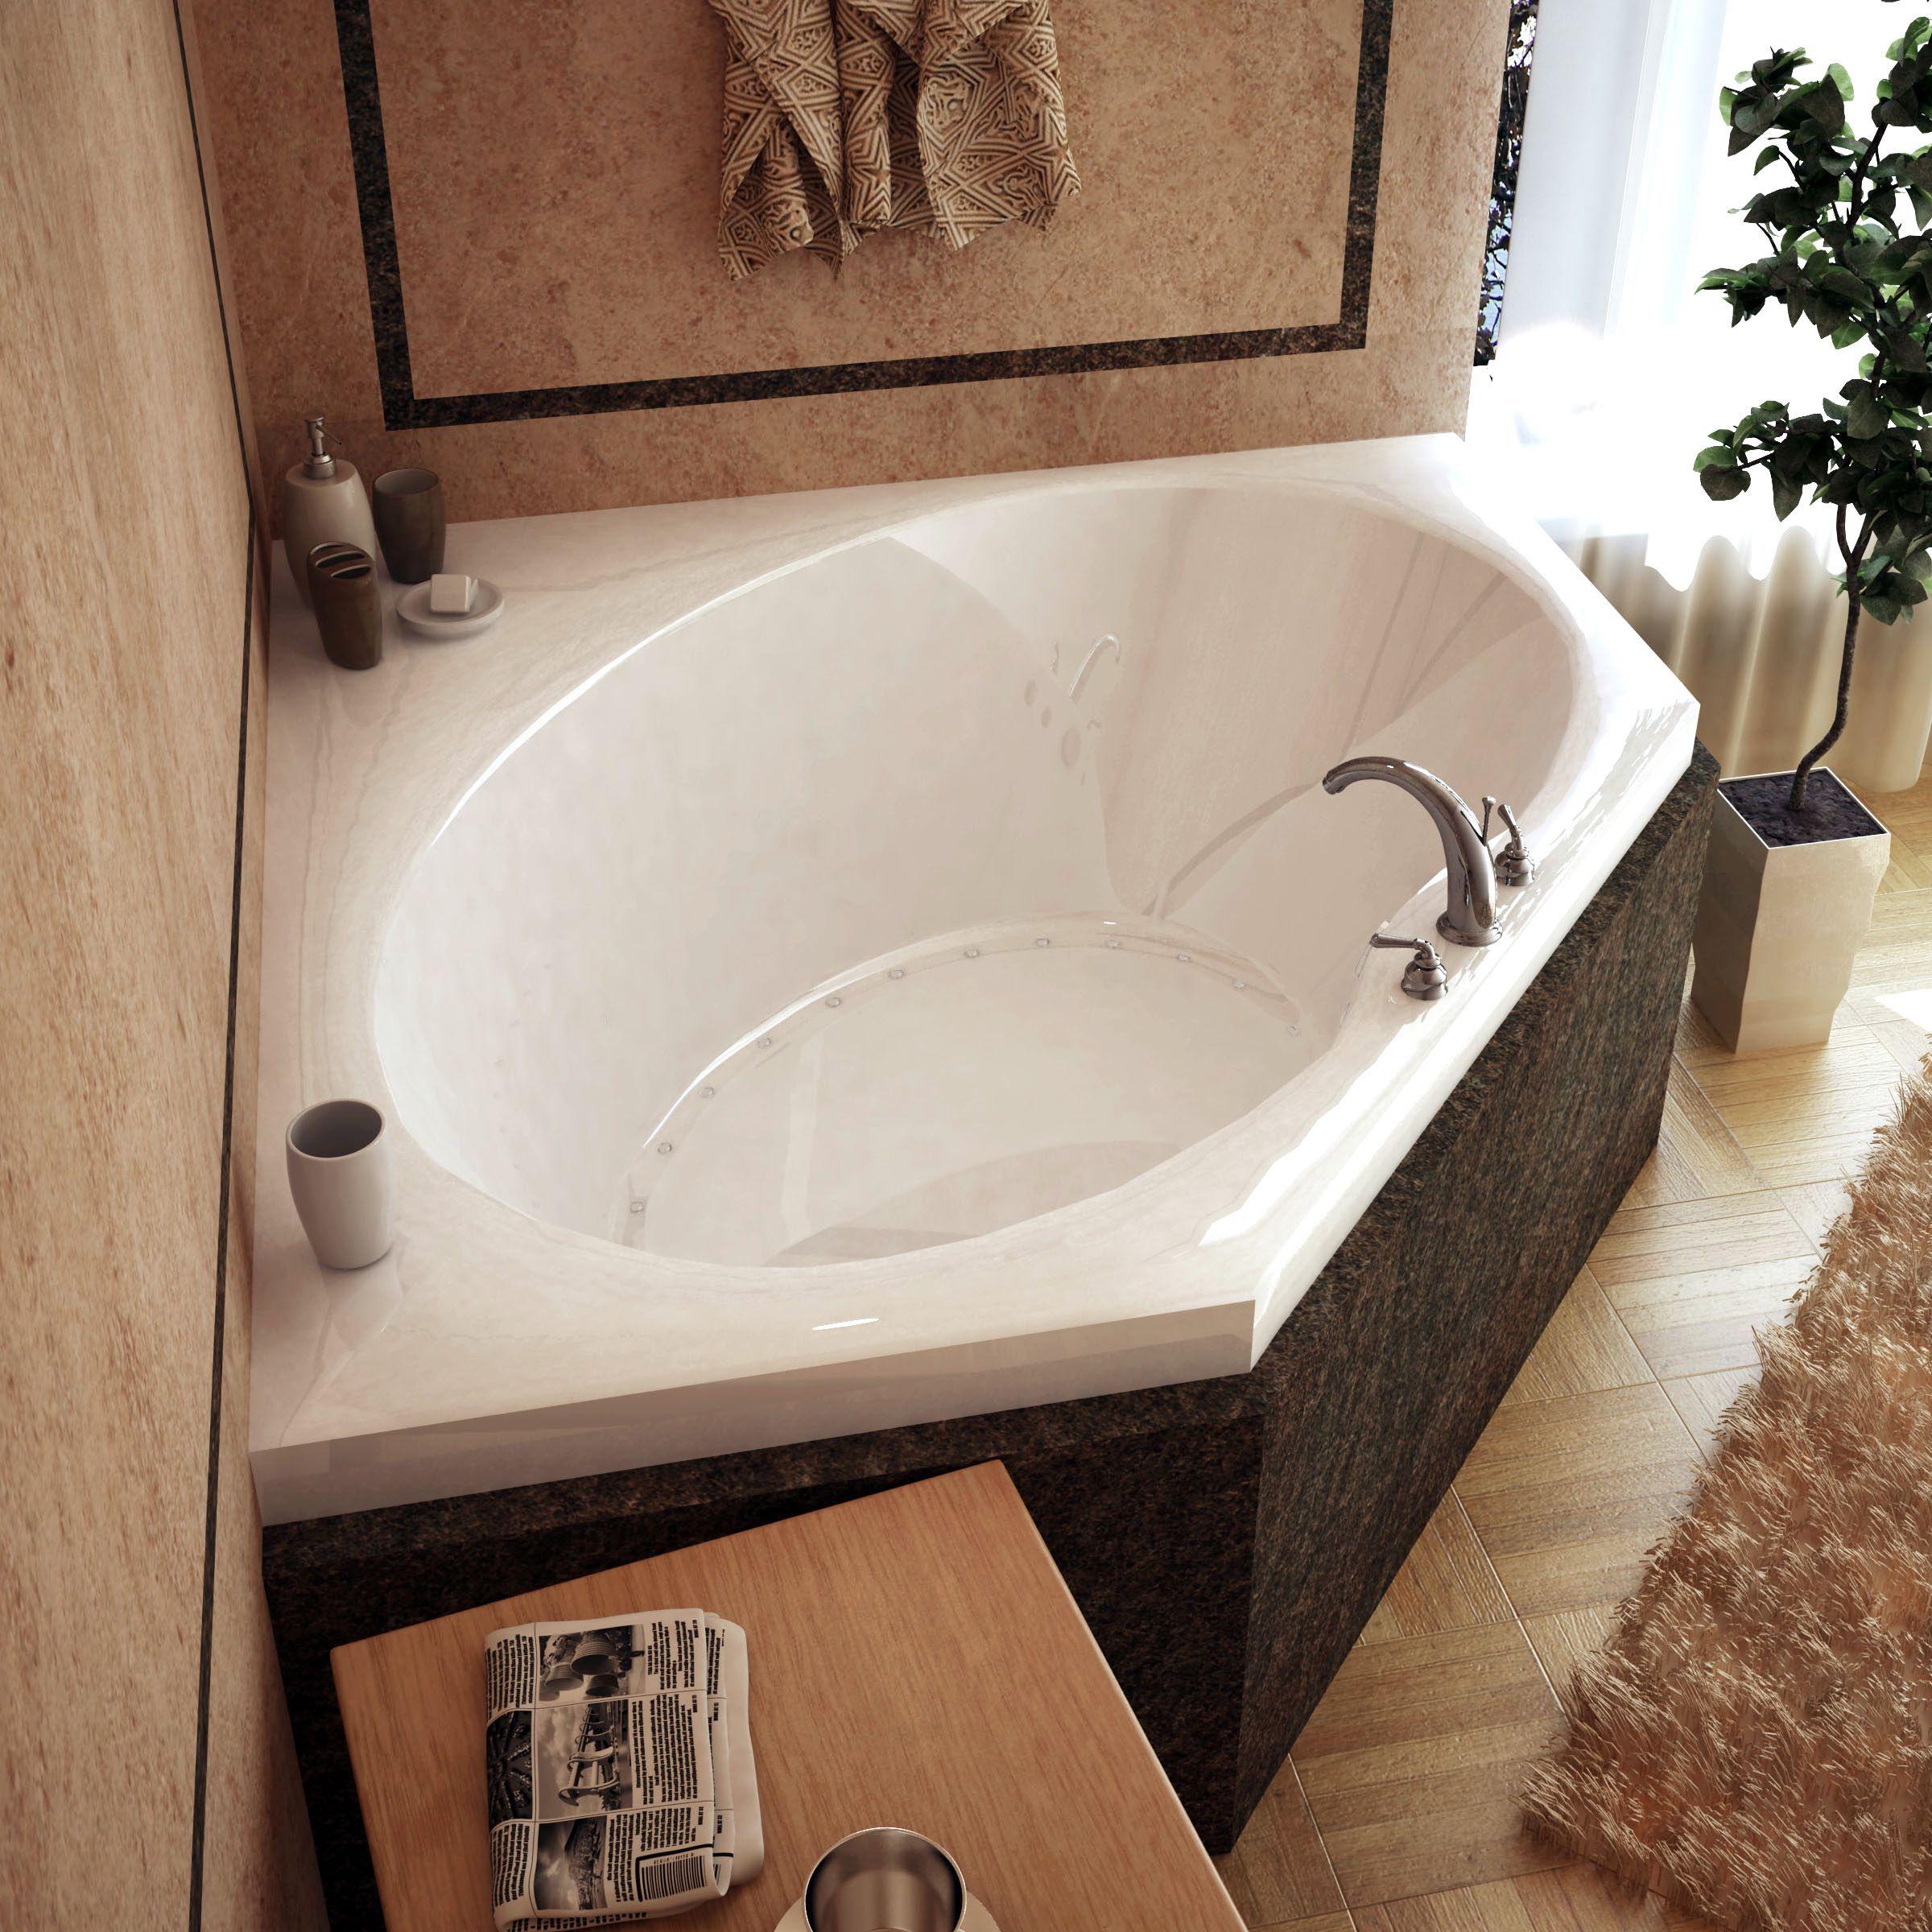 Mountain Home View 60x60-inch Acrylic Air JettedDrop-in Bathtub ...